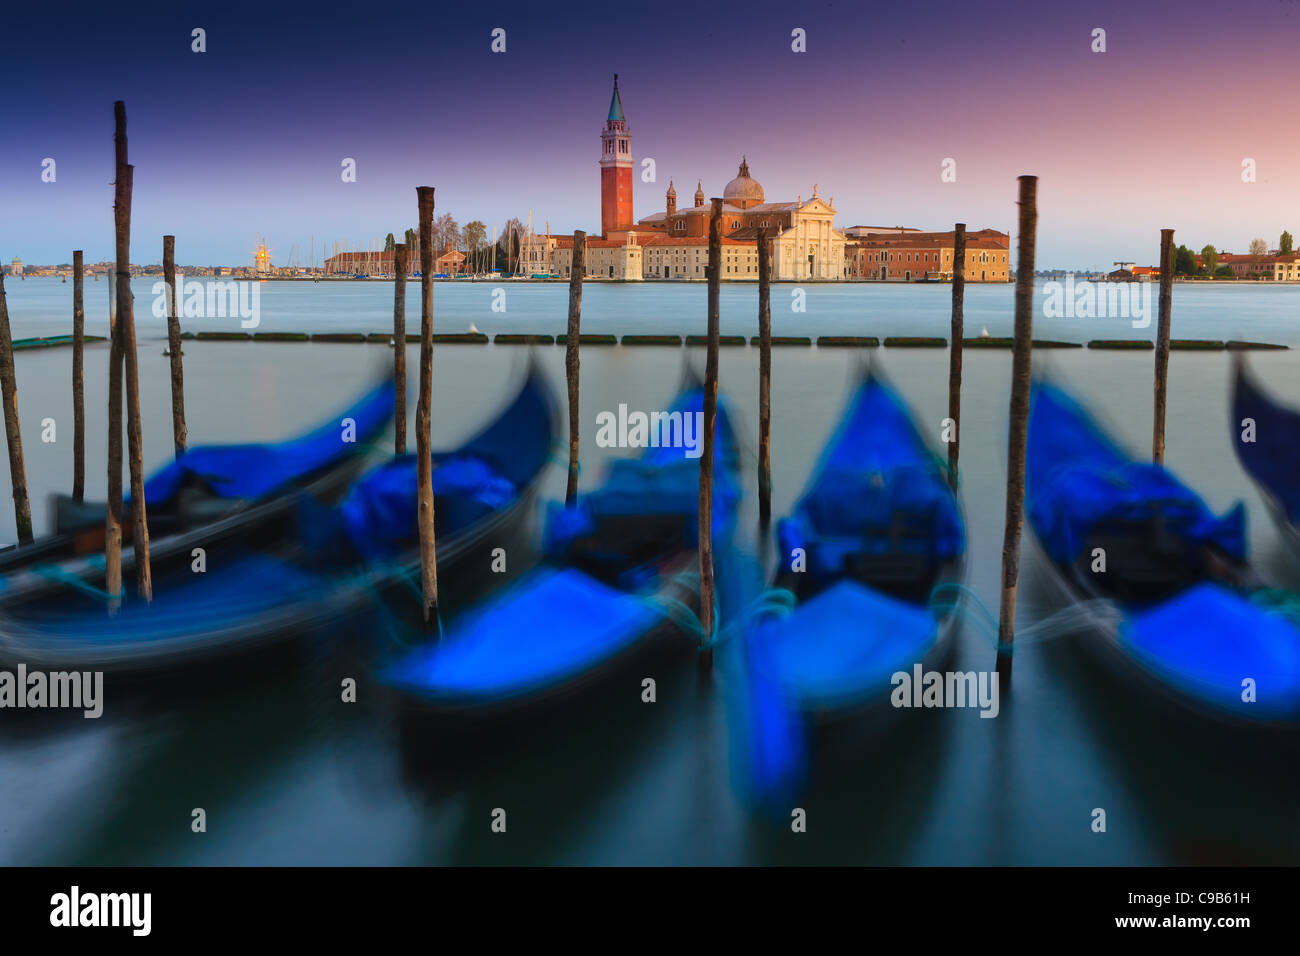 Sonnenaufgang in Venedig mit Blick vom San Marco Platz in Richtung San Giorgio Maggiore Stockbild